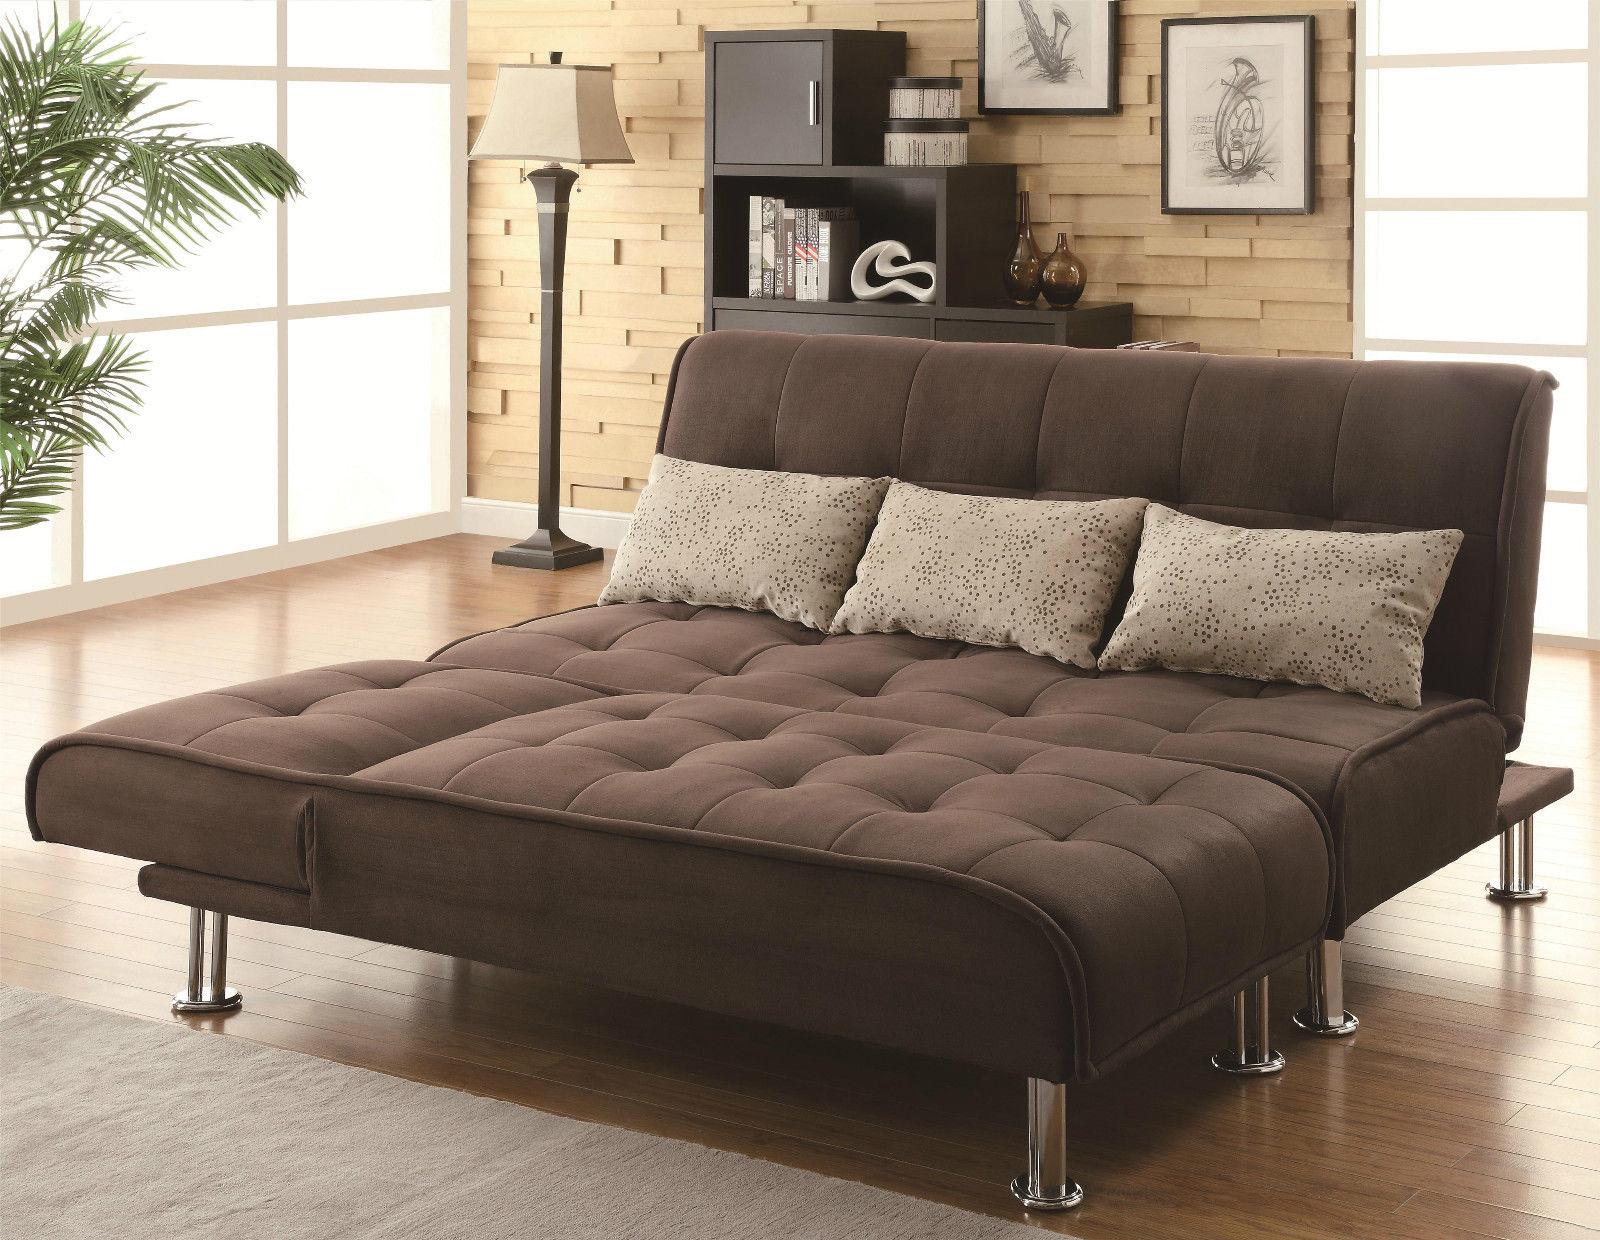 Small Sectional Sleeper Sofa Cheap